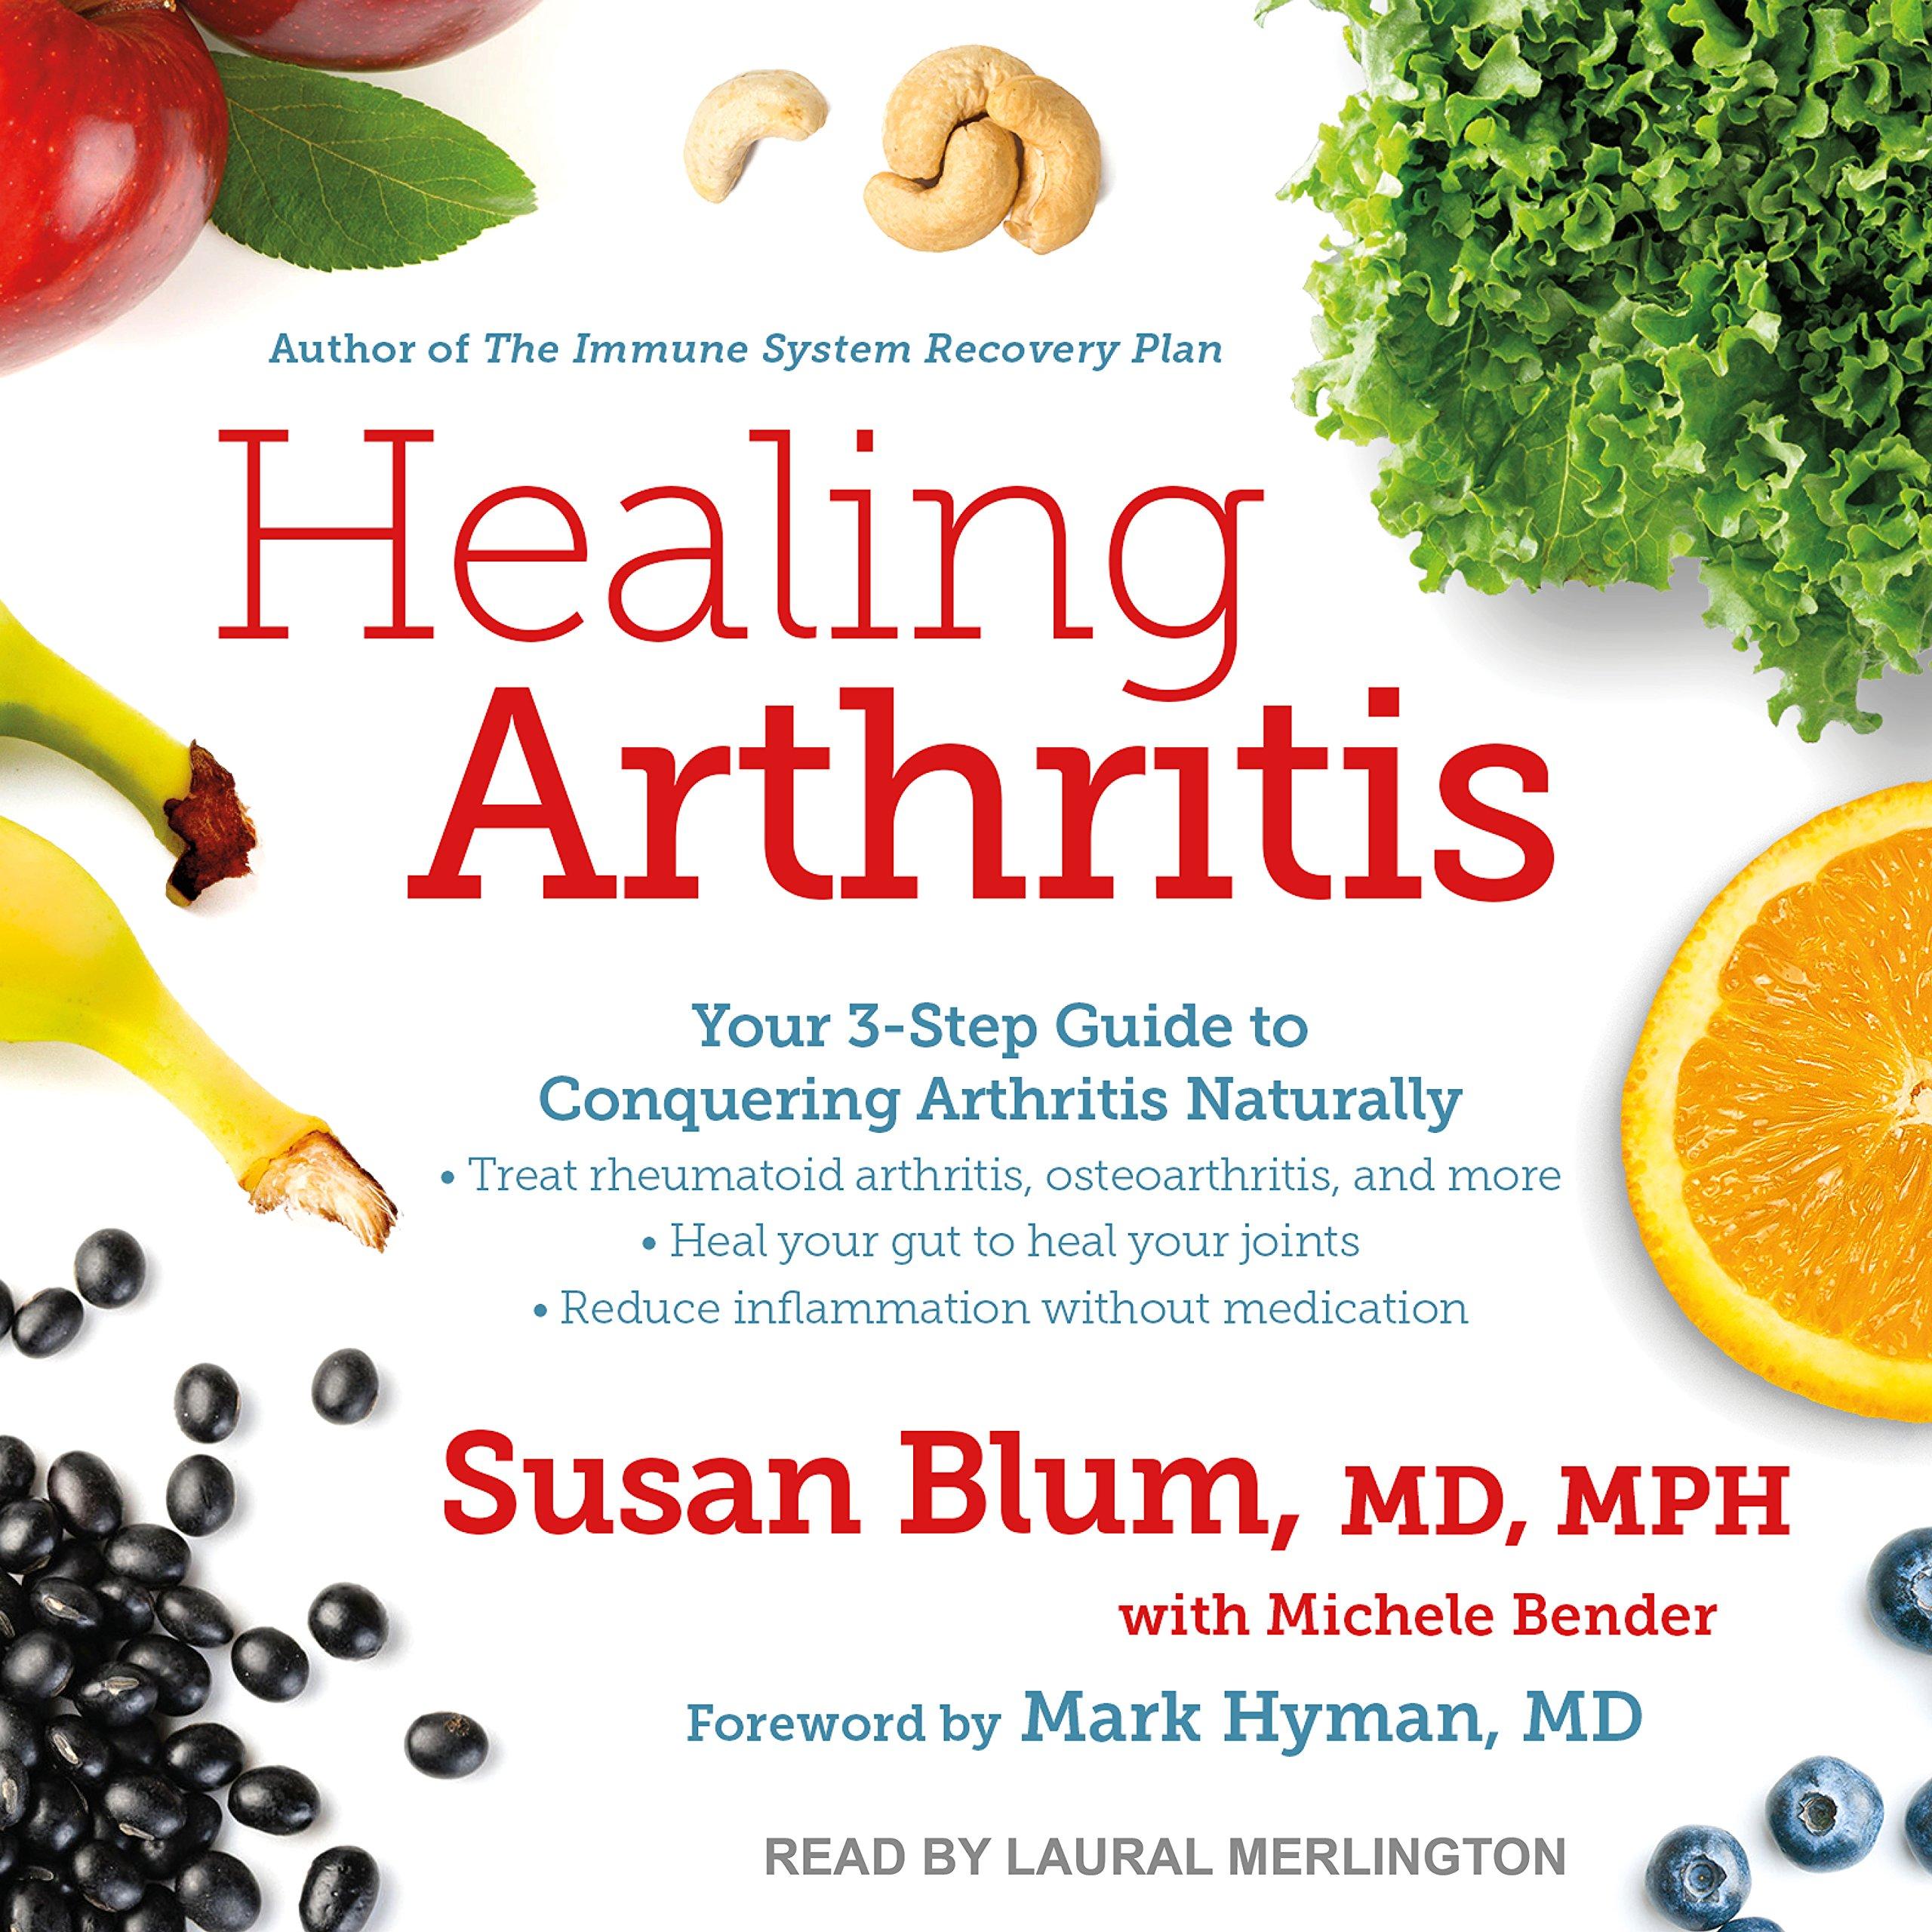 how can i treat arthritis naturally